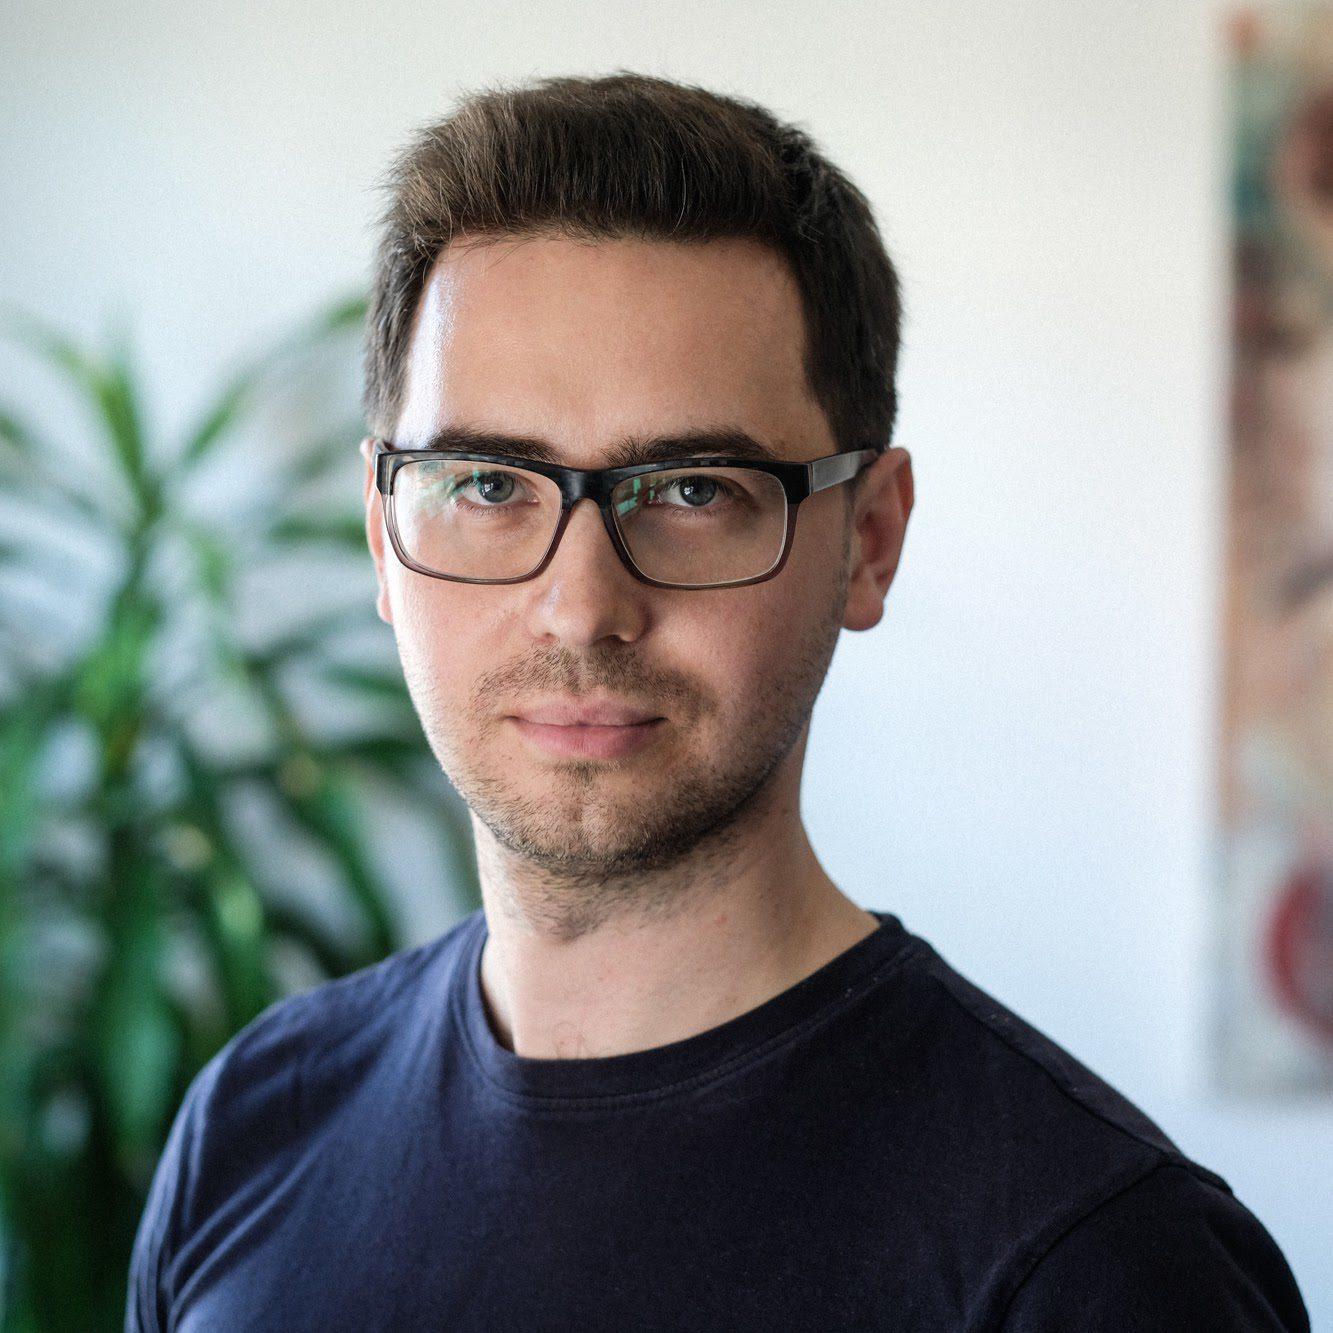 Denis Pakhaliuk on Why Robotic Process Automation Is Good ...